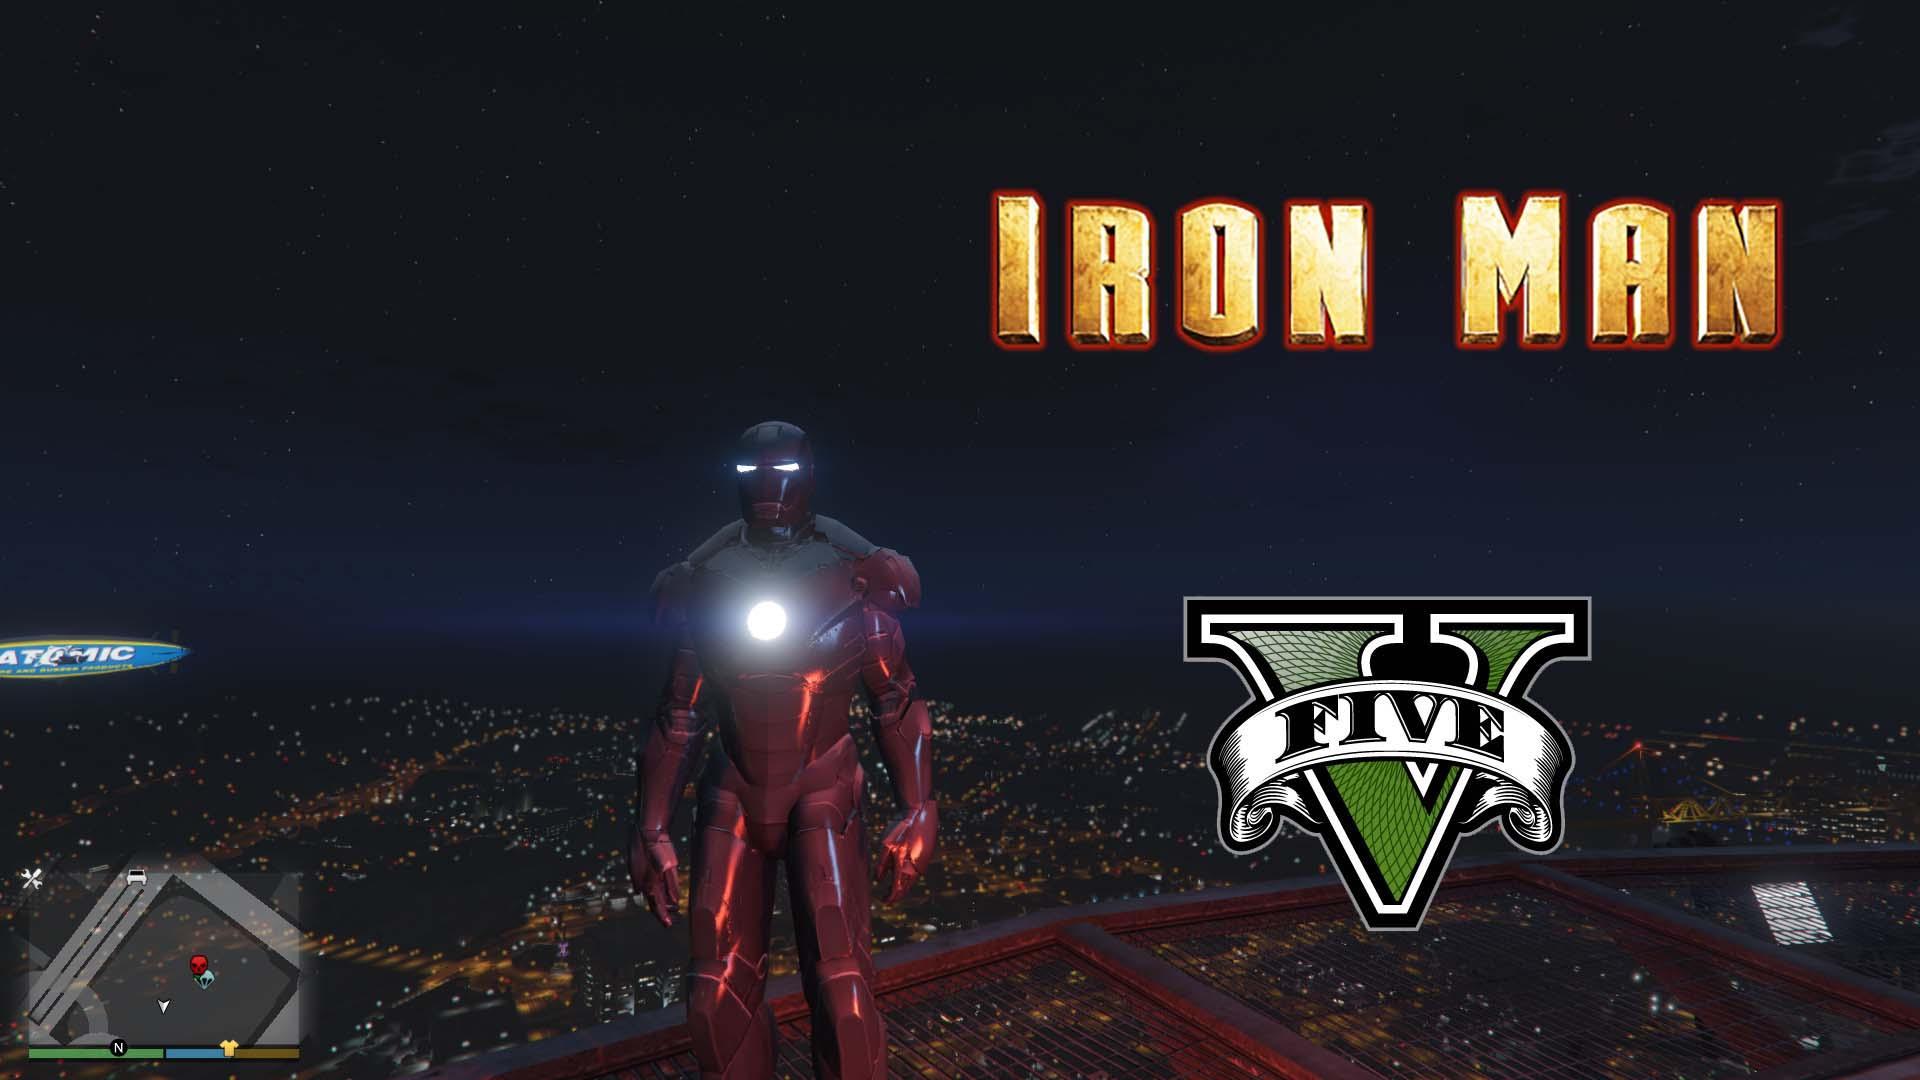 Iron Man 2: Iron Man Mark 2 [Add-On Ped]